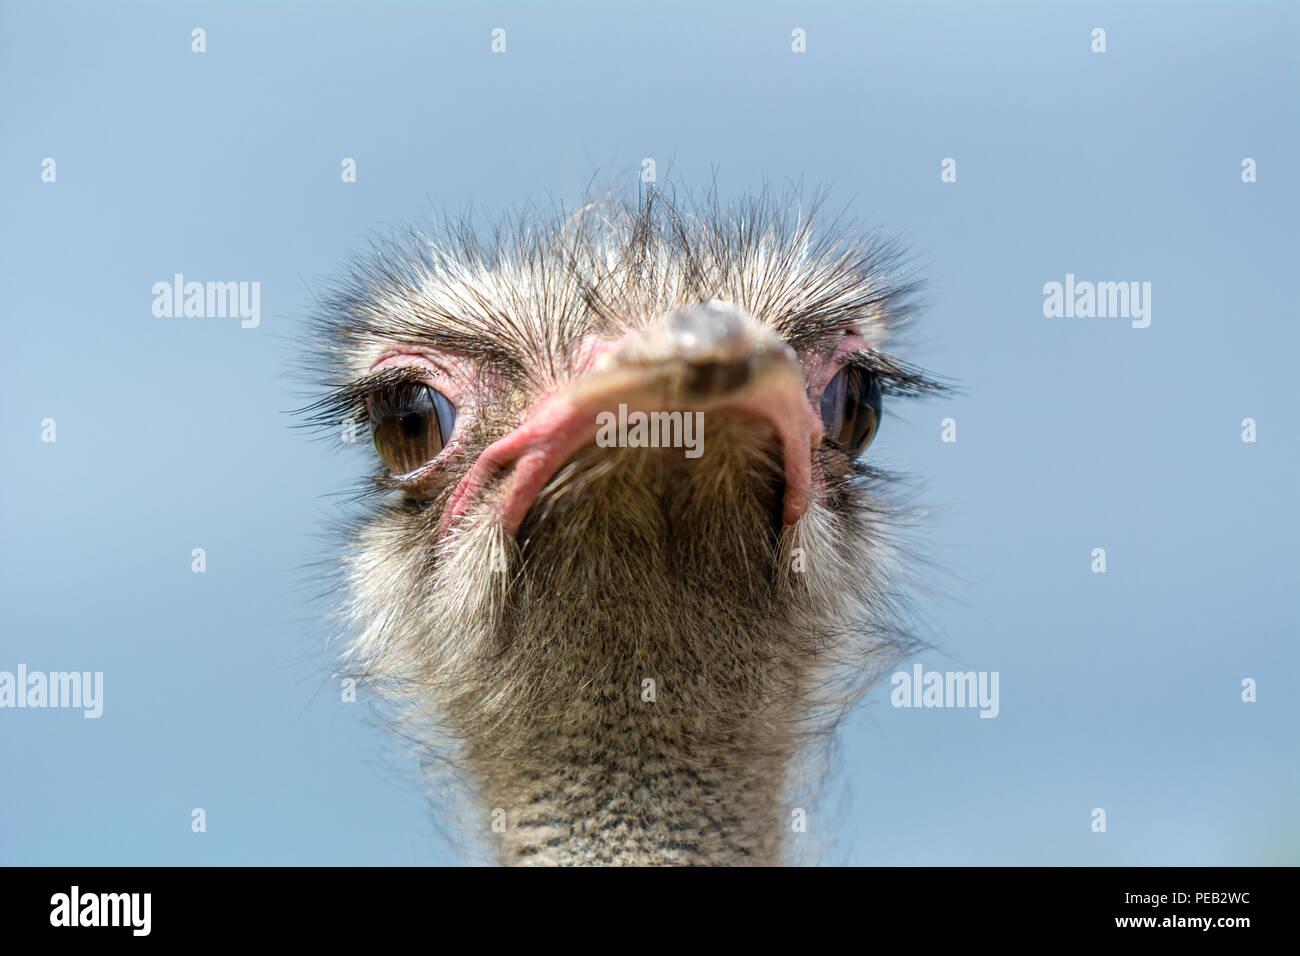 La cabeza de un avestruz closeup sobre un fondo azul. Vista delantera. Imagen De Stock